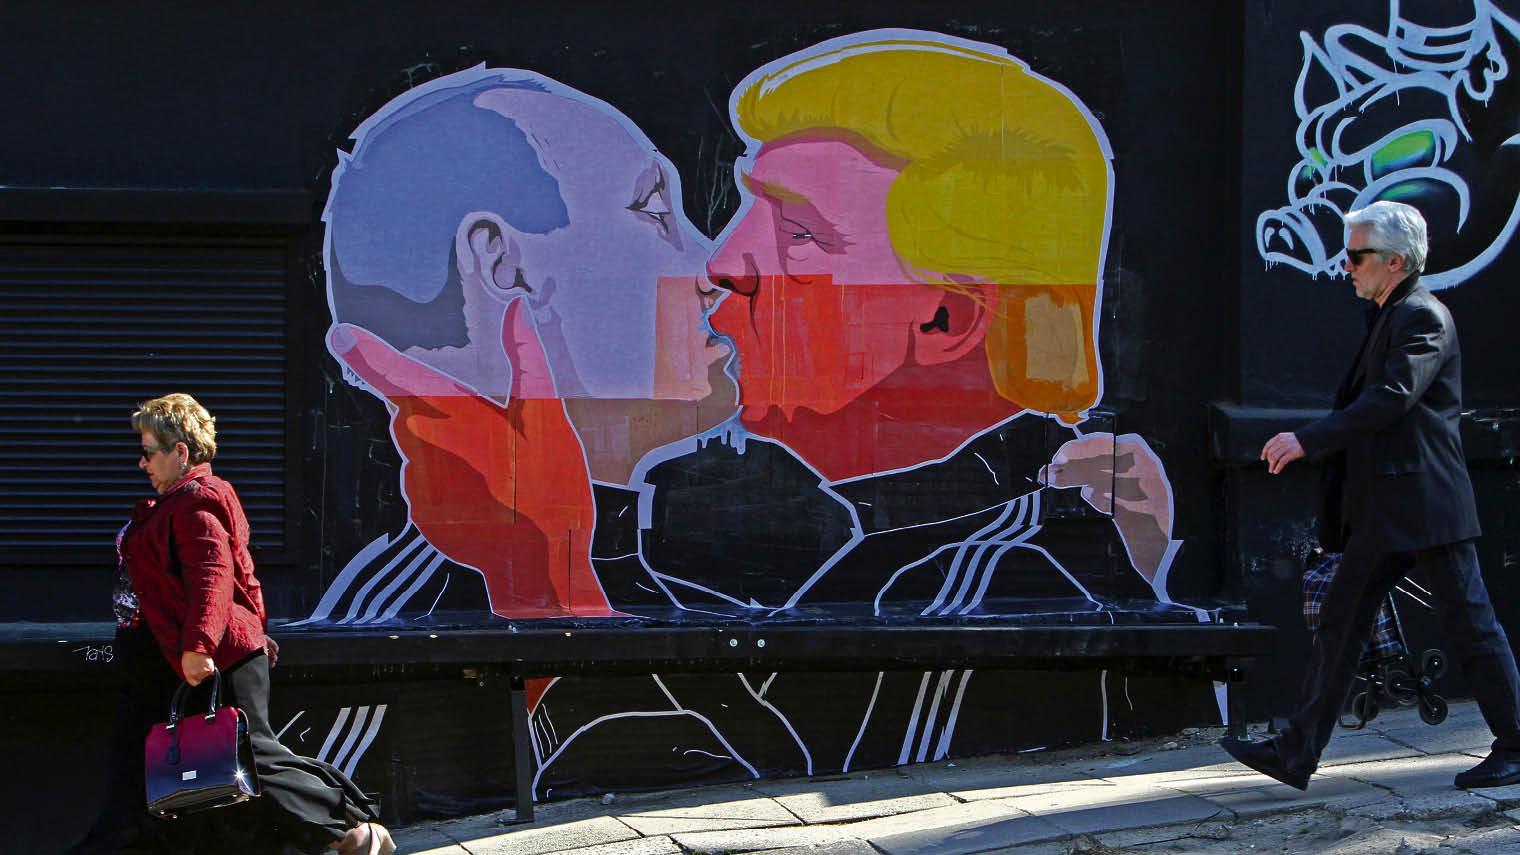 Putin and Trump Kissing graffiti